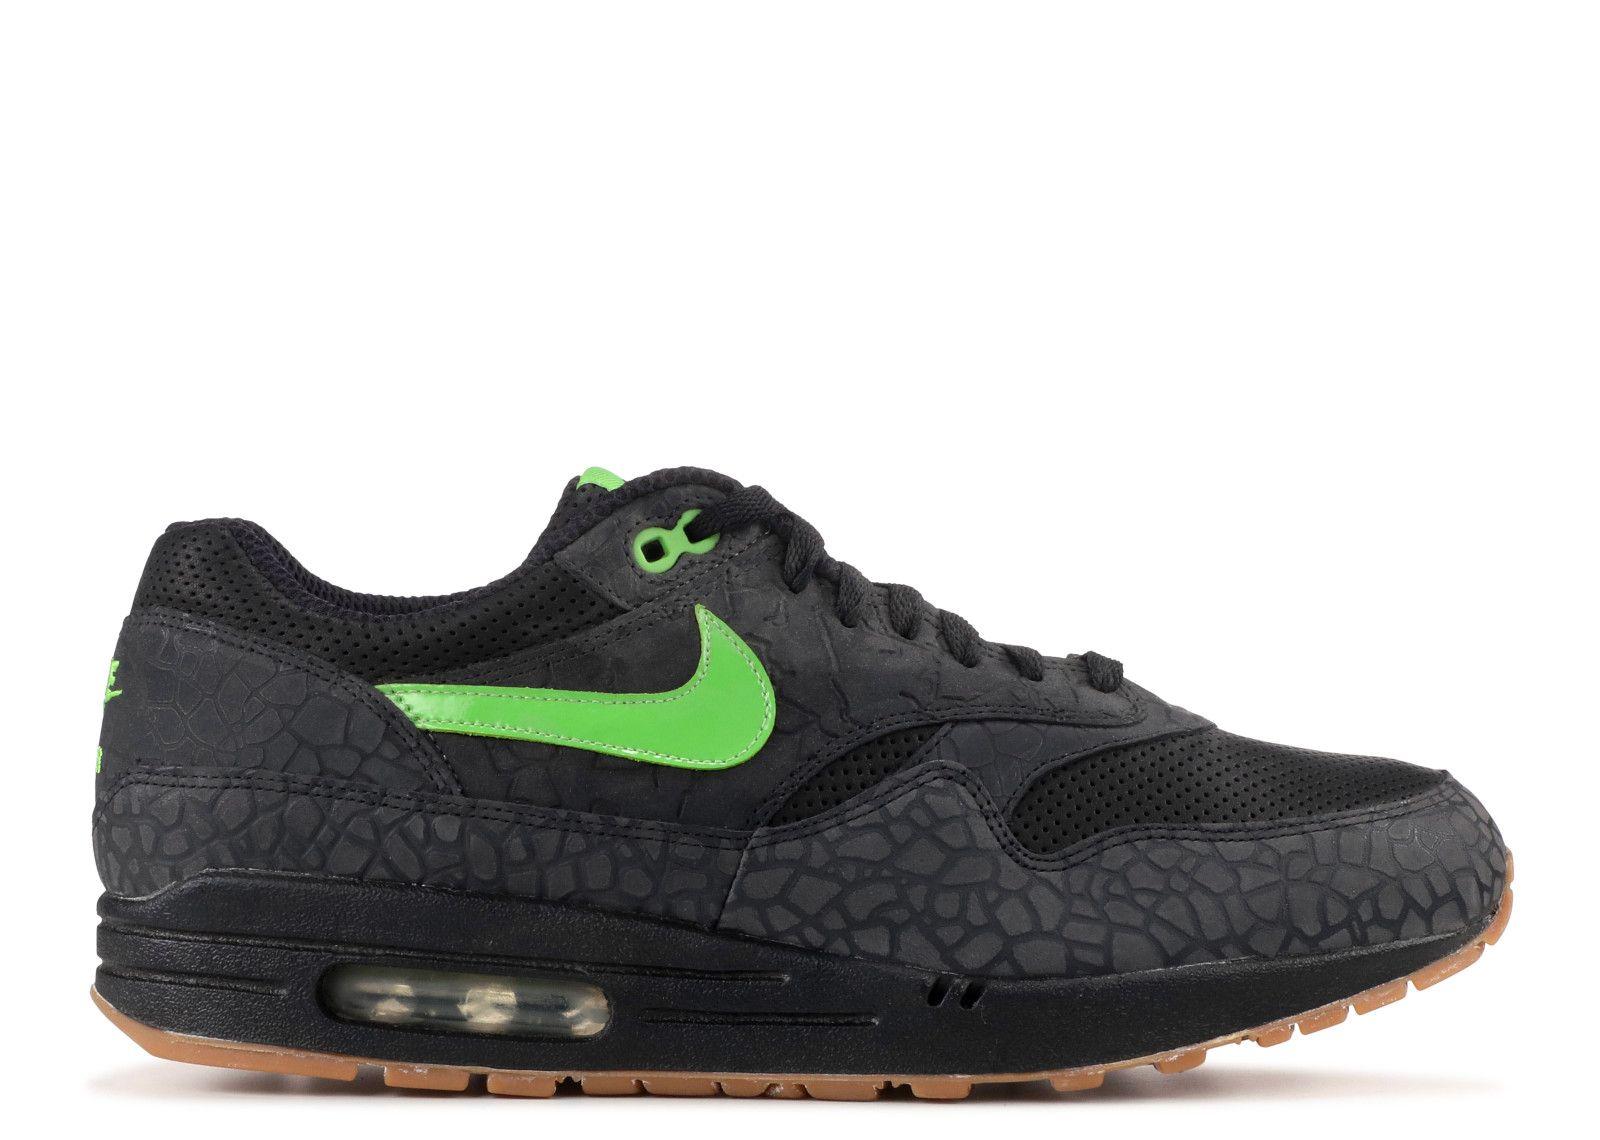 Nike Air Max 90 Anniversary Infrared Snake